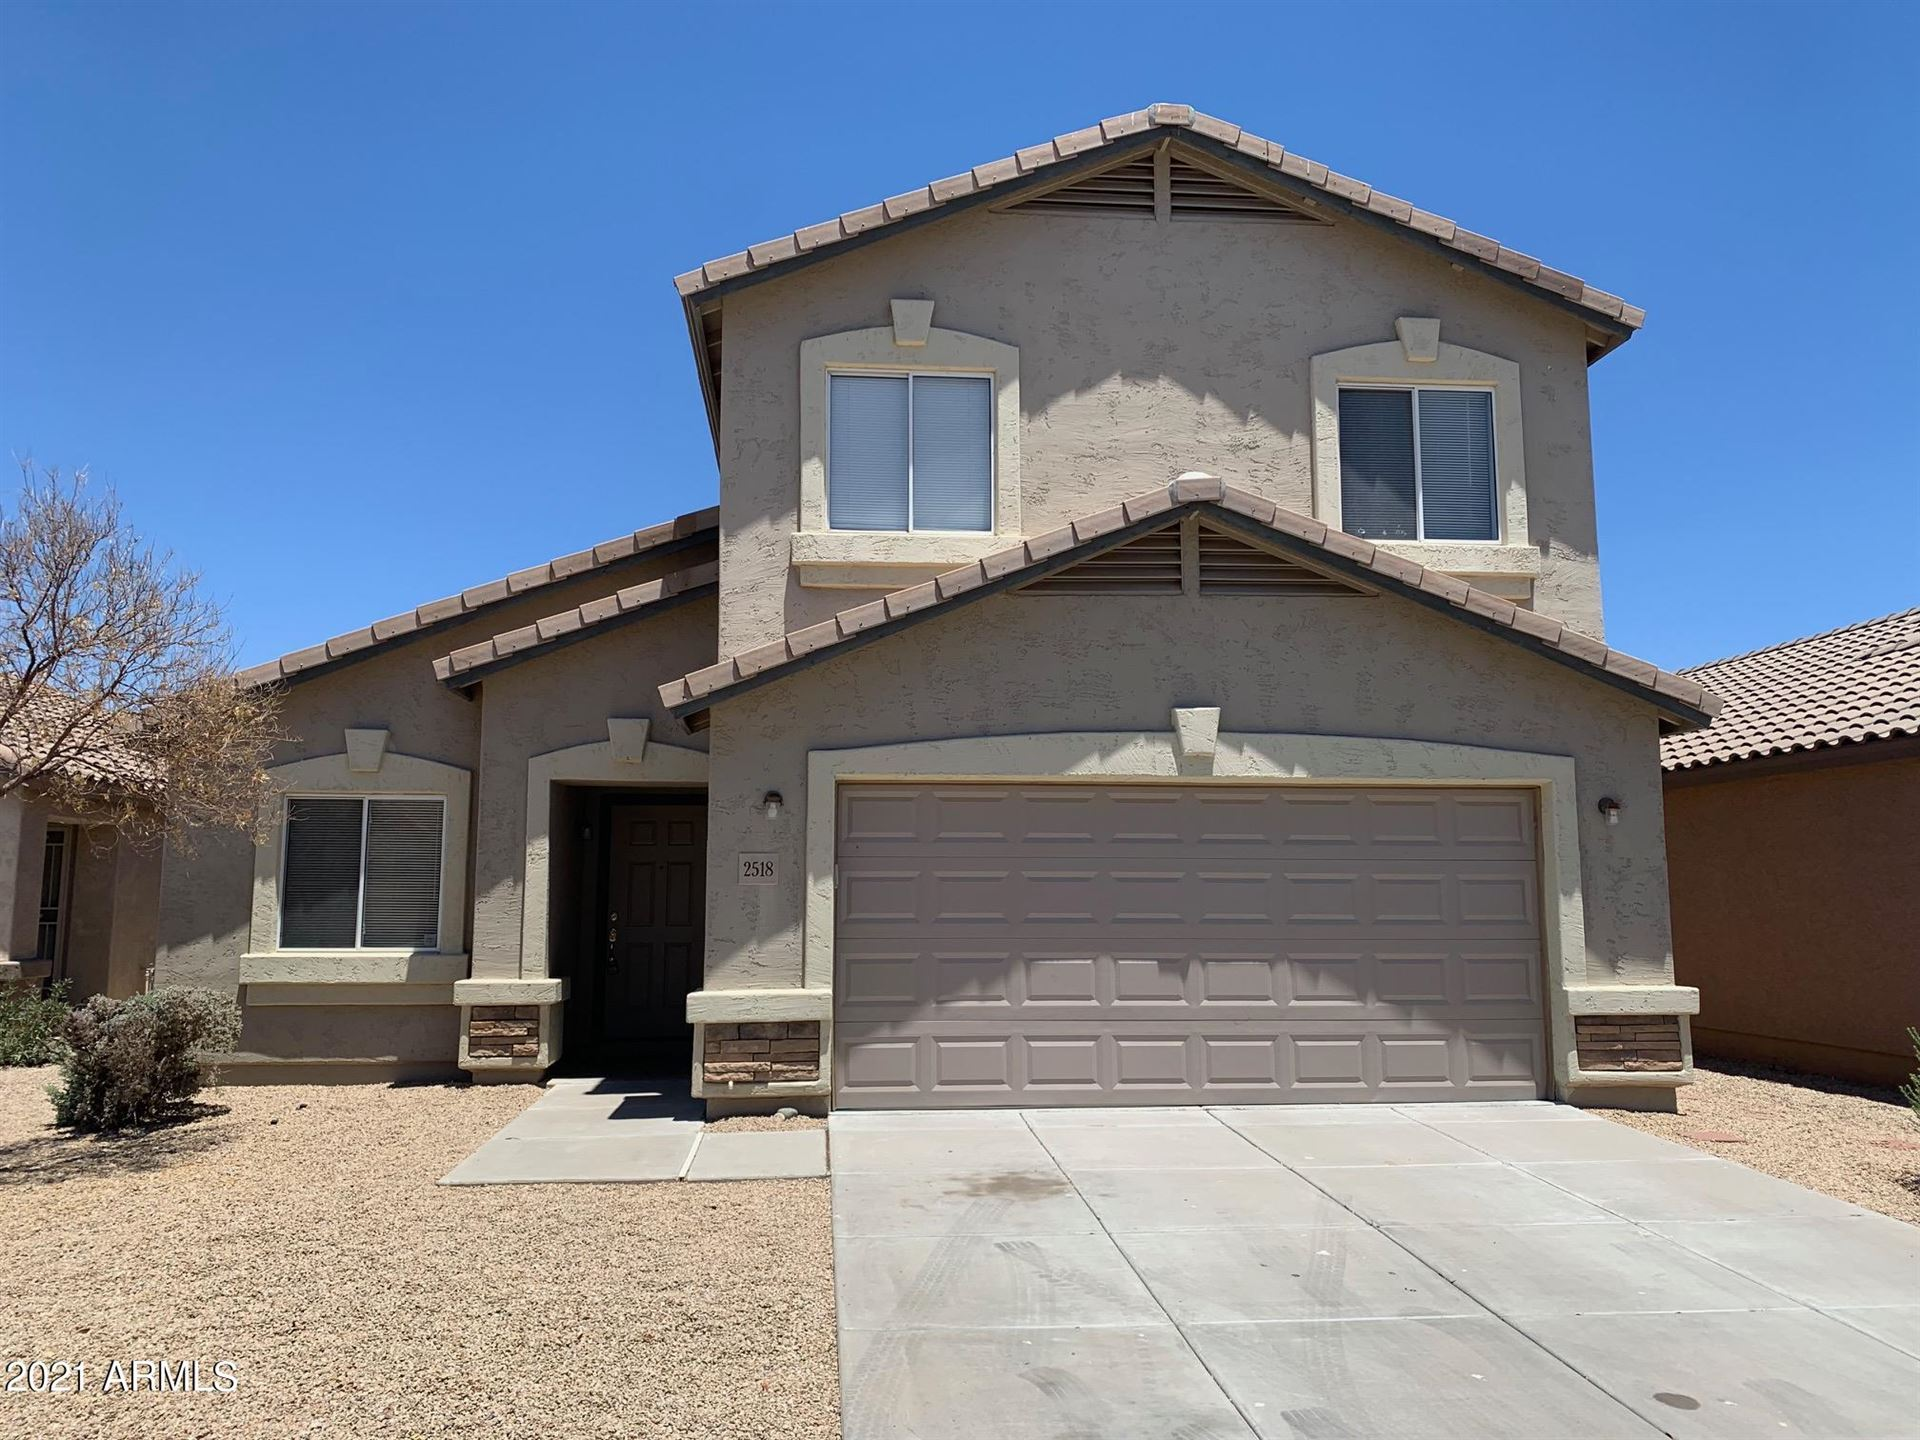 Photo of 2518 E OLIVINE Road, San Tan Valley, AZ 85143 (MLS # 6249910)